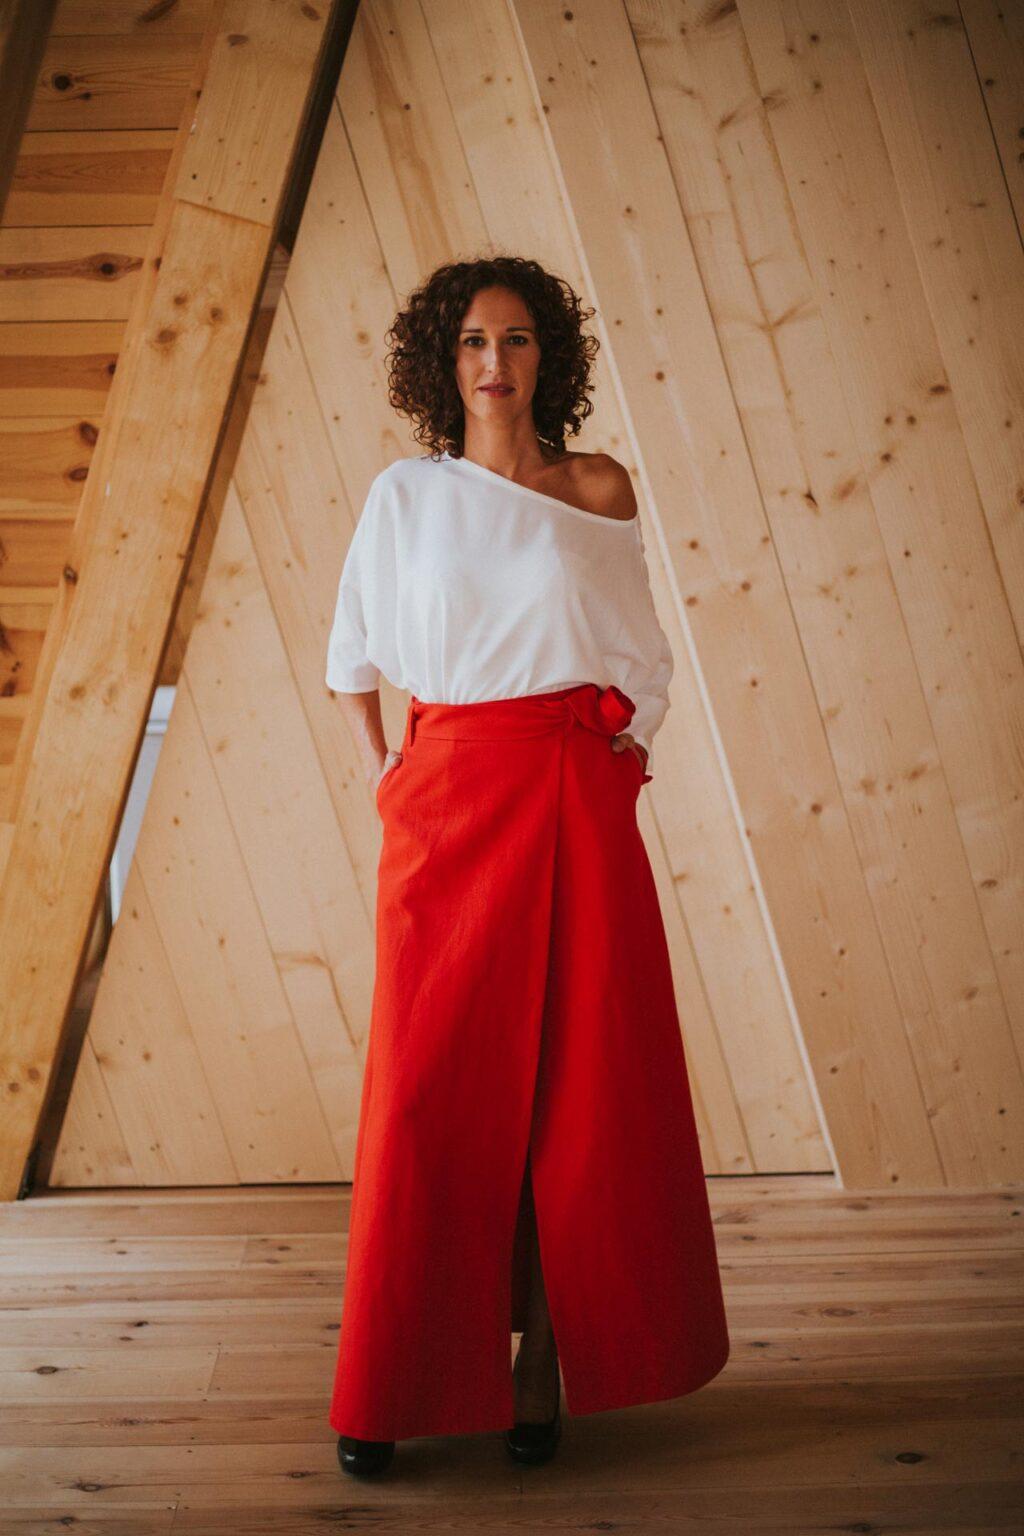 Rojo-Maldita-María-Falda-larga-pareo-con-cinturón-detalle-lateral